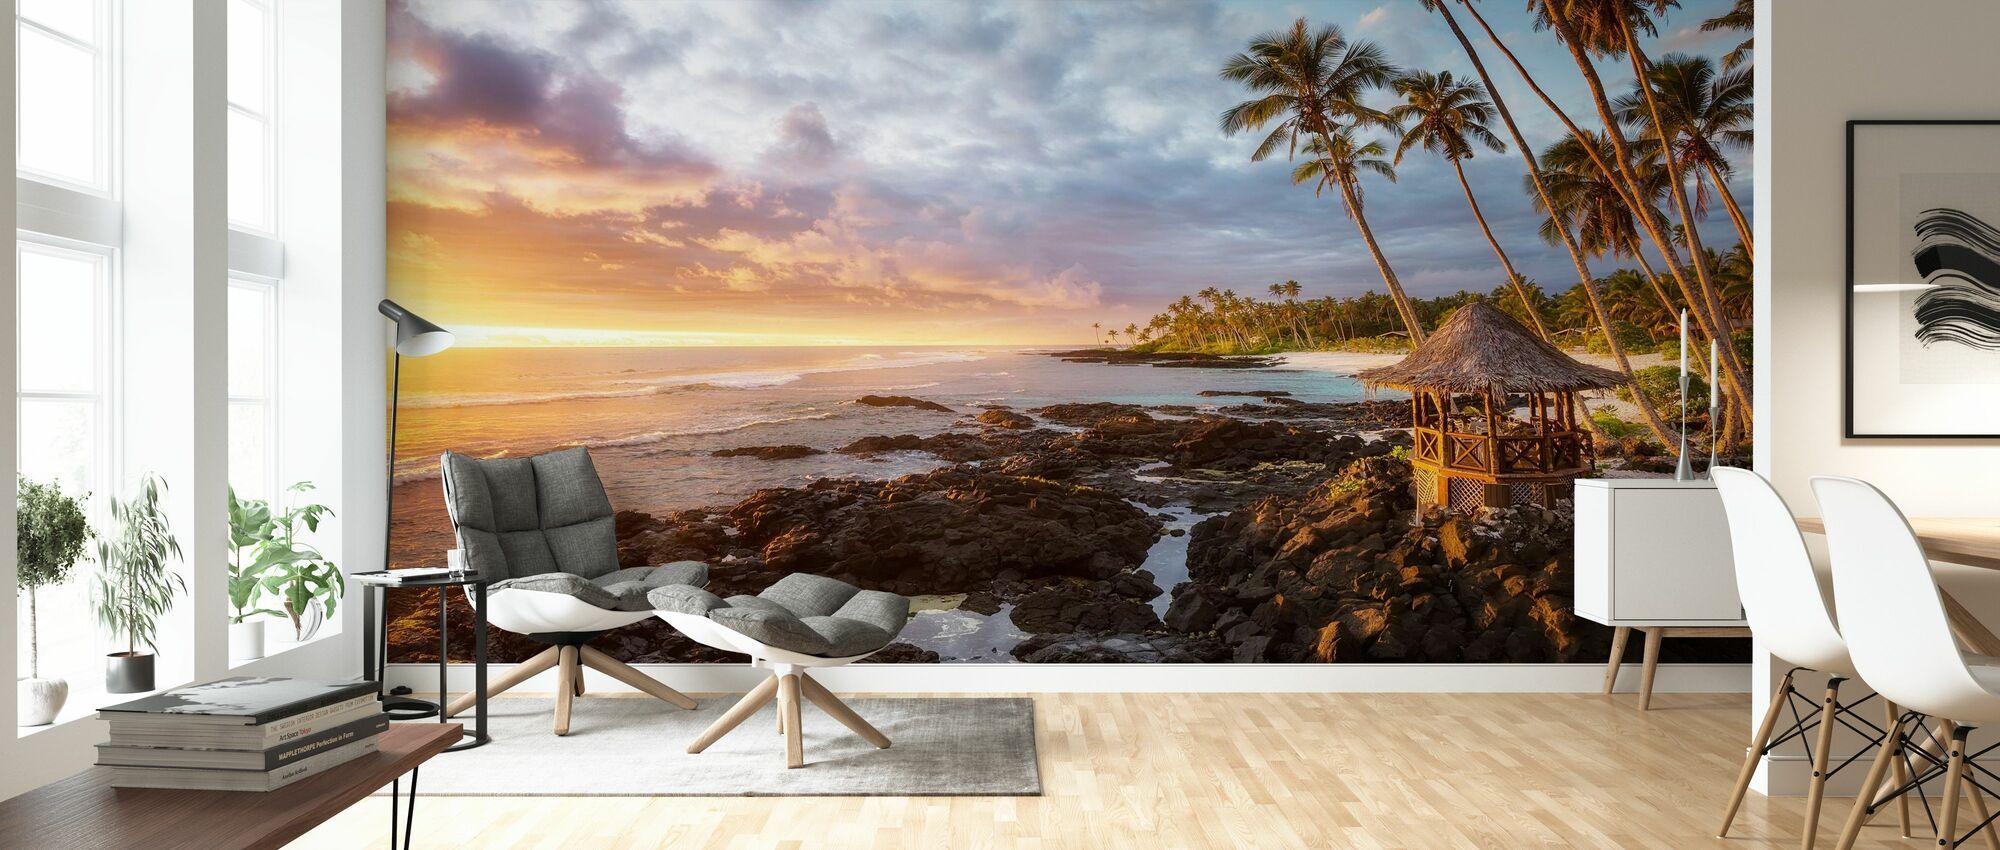 Return to Paradise - Wallpaper - Living Room